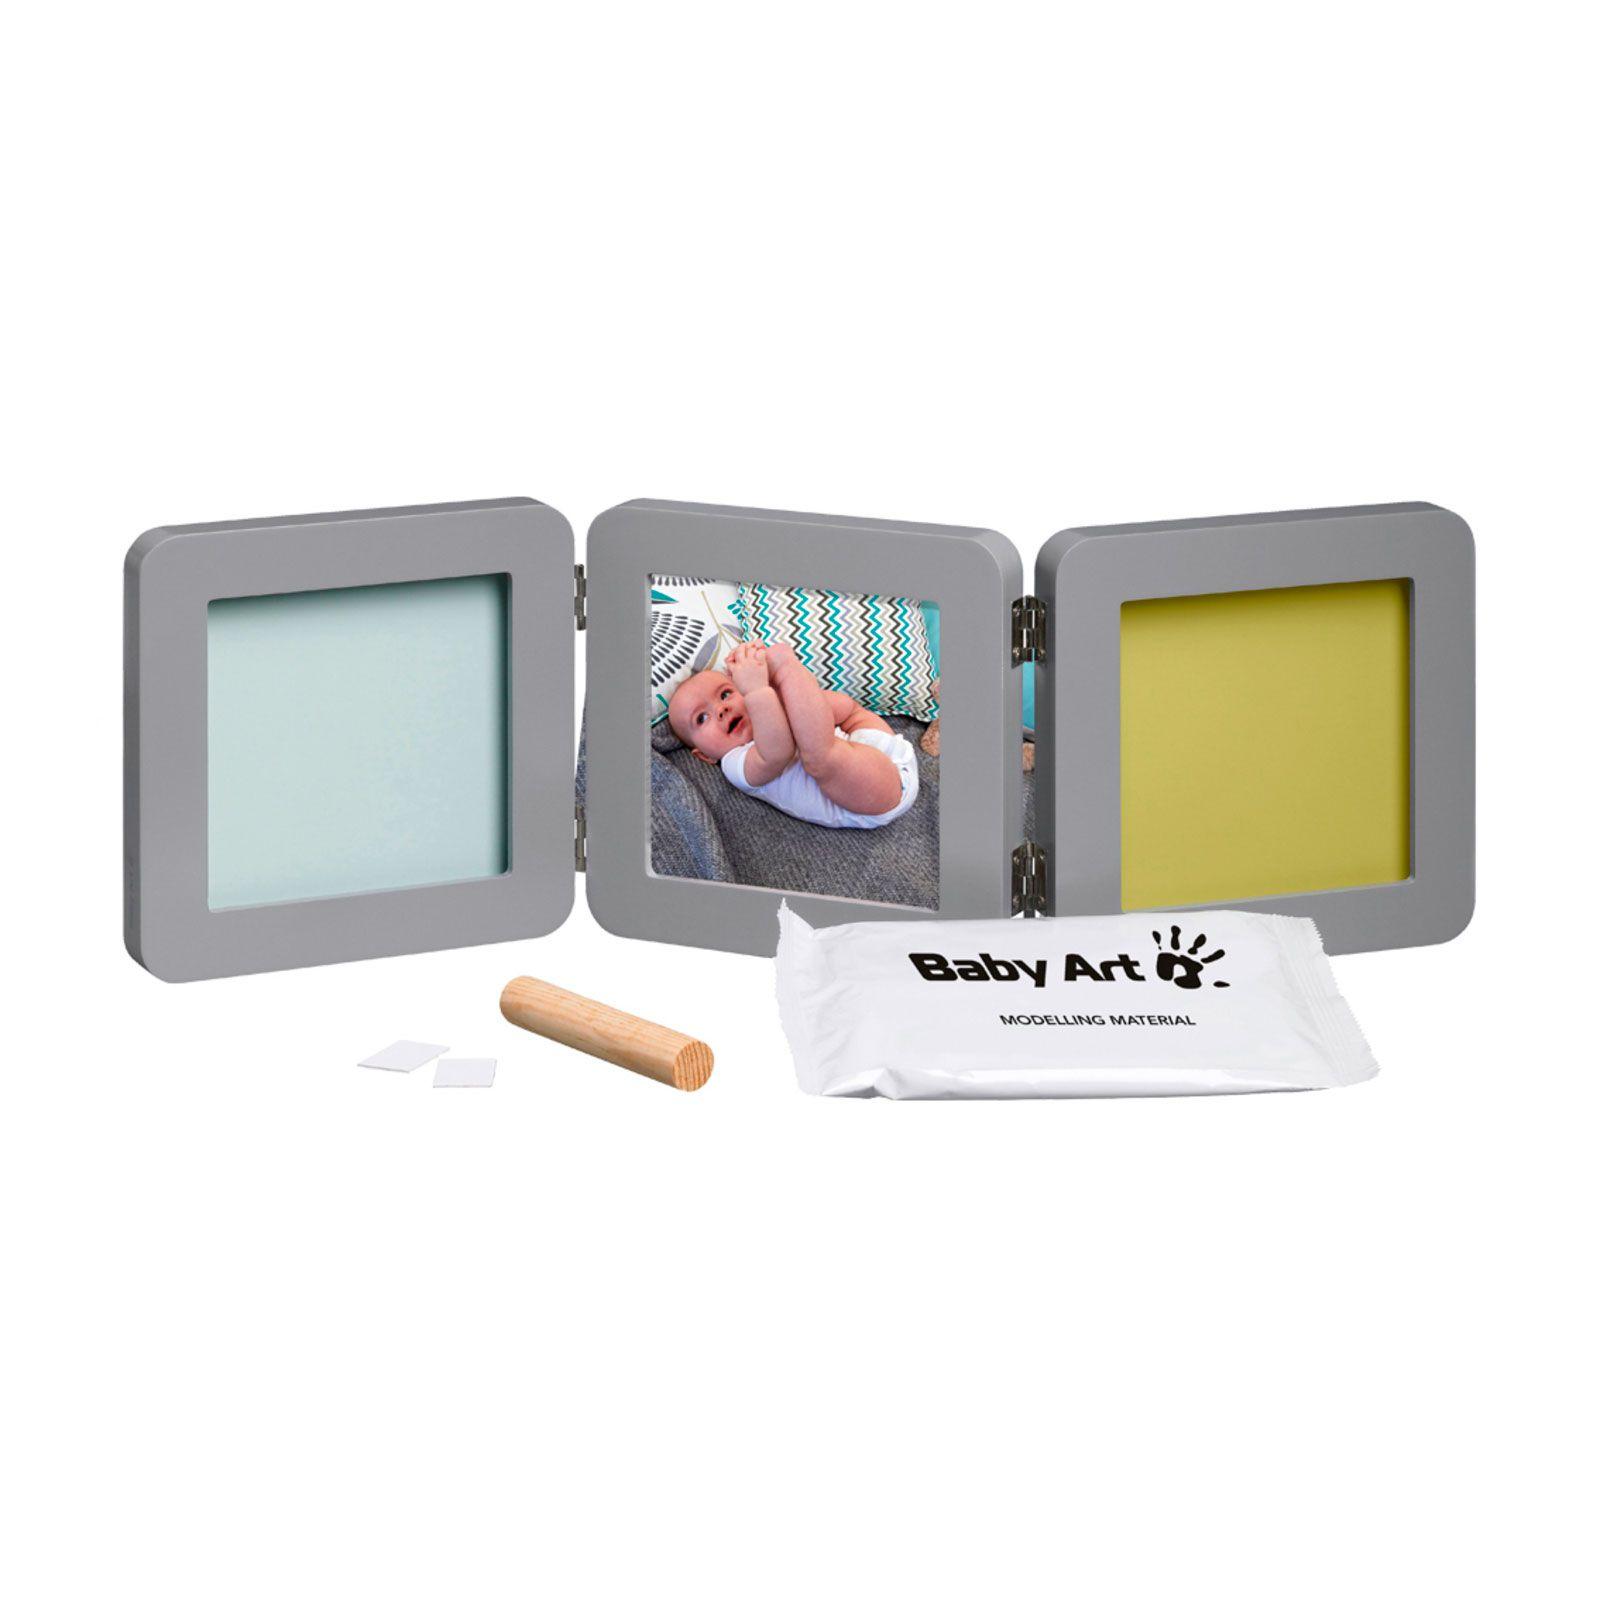 Baby Art Touch Triplo 1p Grey - Dorel Ref Imp91437